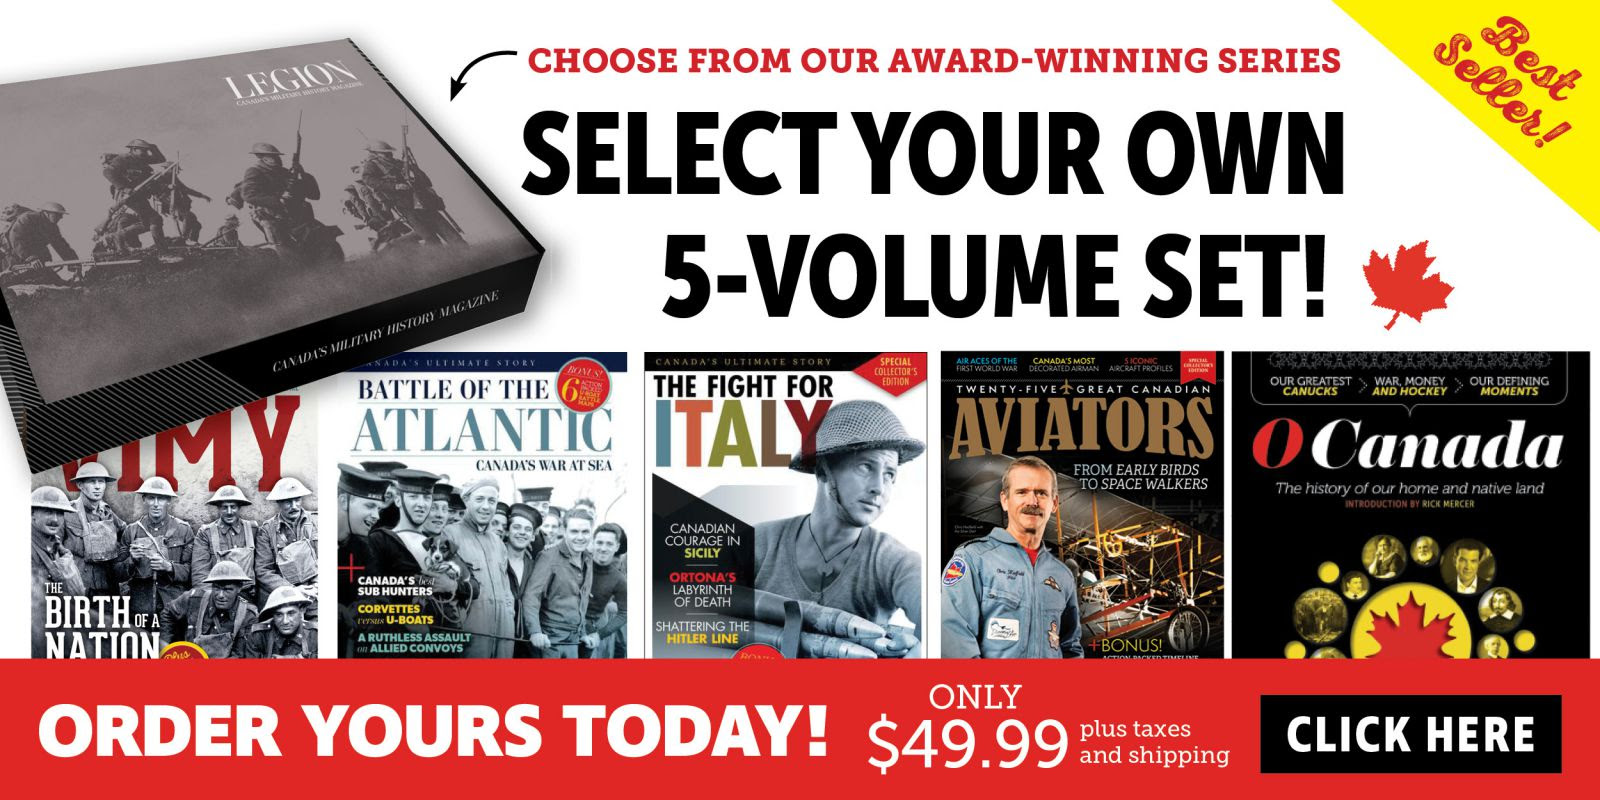 Best-Selling 5-Volume Set